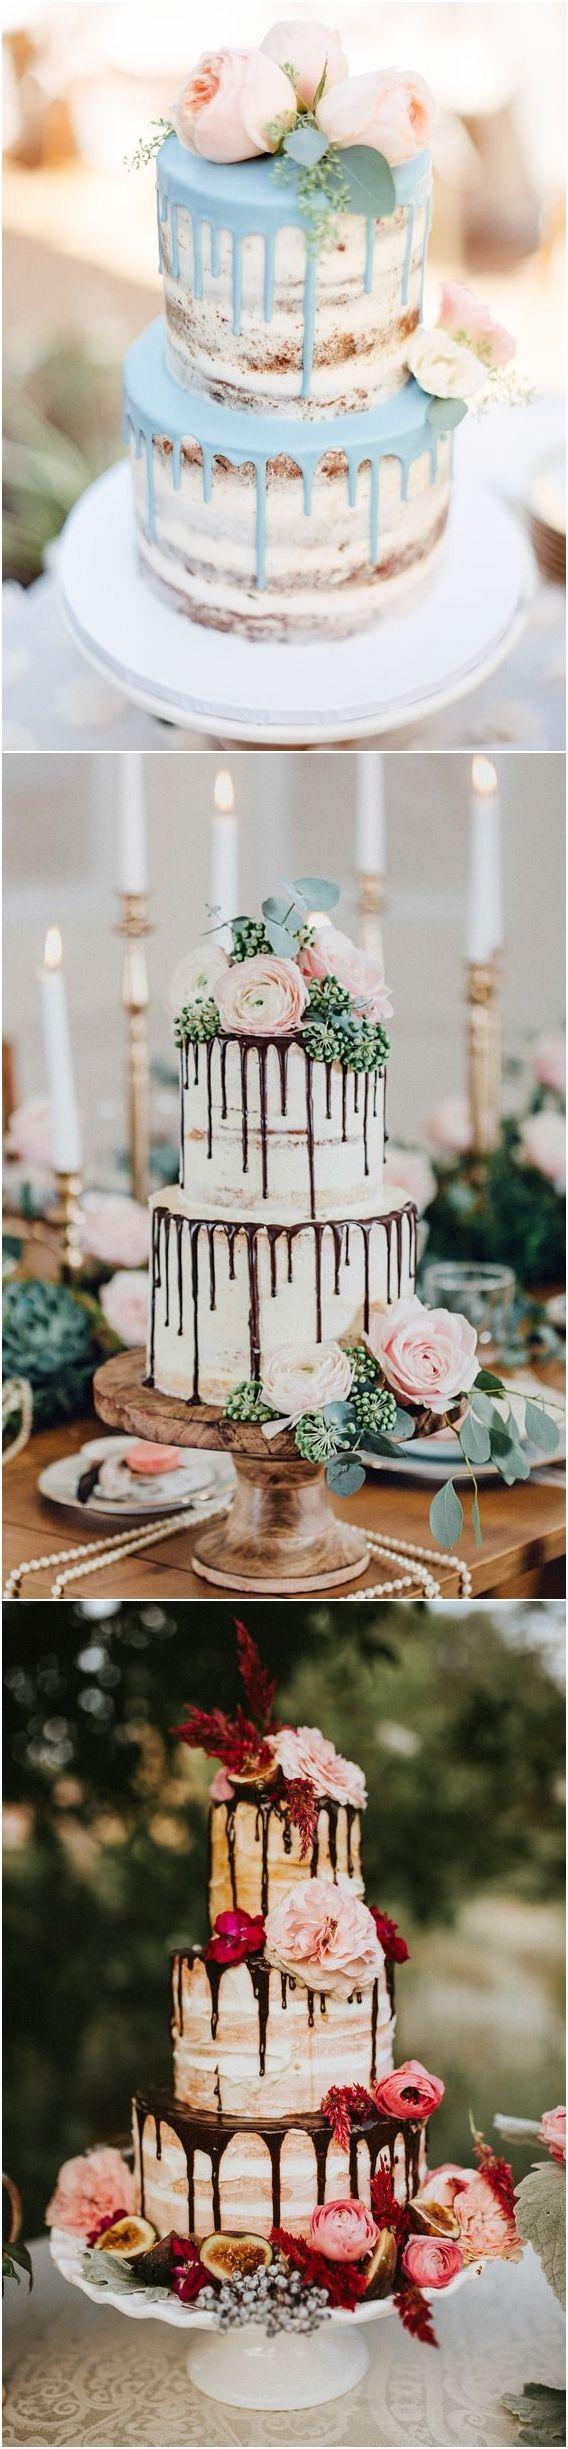 Traditional wedding decor ideas 2018  Top  Wedding Cake Trends In   cakes  Pinterest  Wedding cake